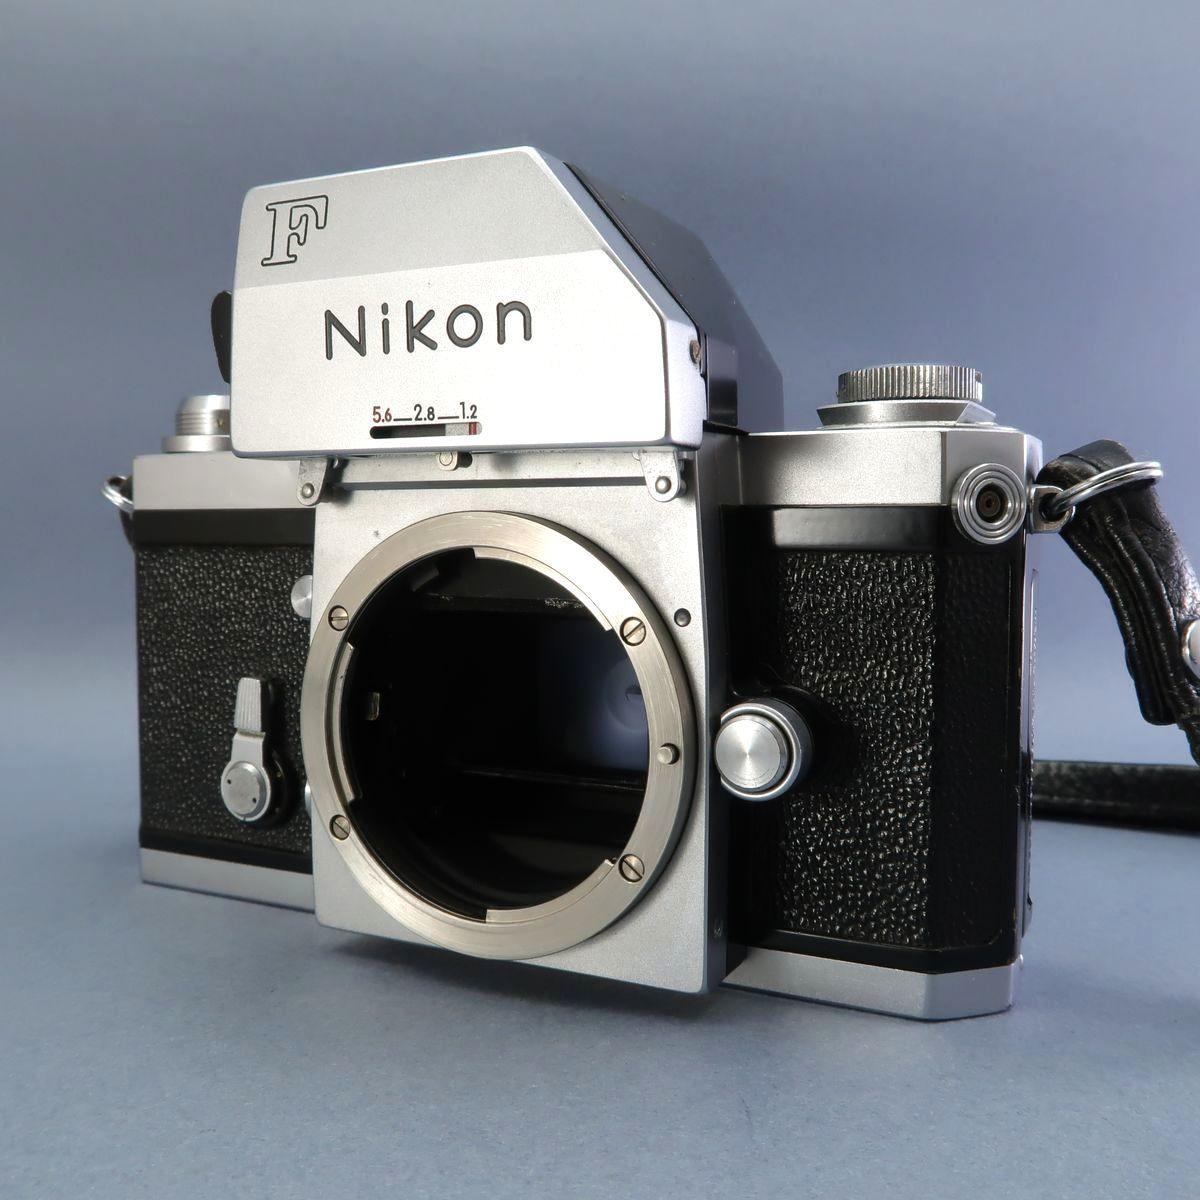 ★Nikon F フィルムカメラ 本体 レンズ Nikkor-Auto 105mm F 2.5 28mm F 3.5 NIKKOR-H Auto 1:3.5 f=2.8cm FTN 付属多数 ジャンク_画像3